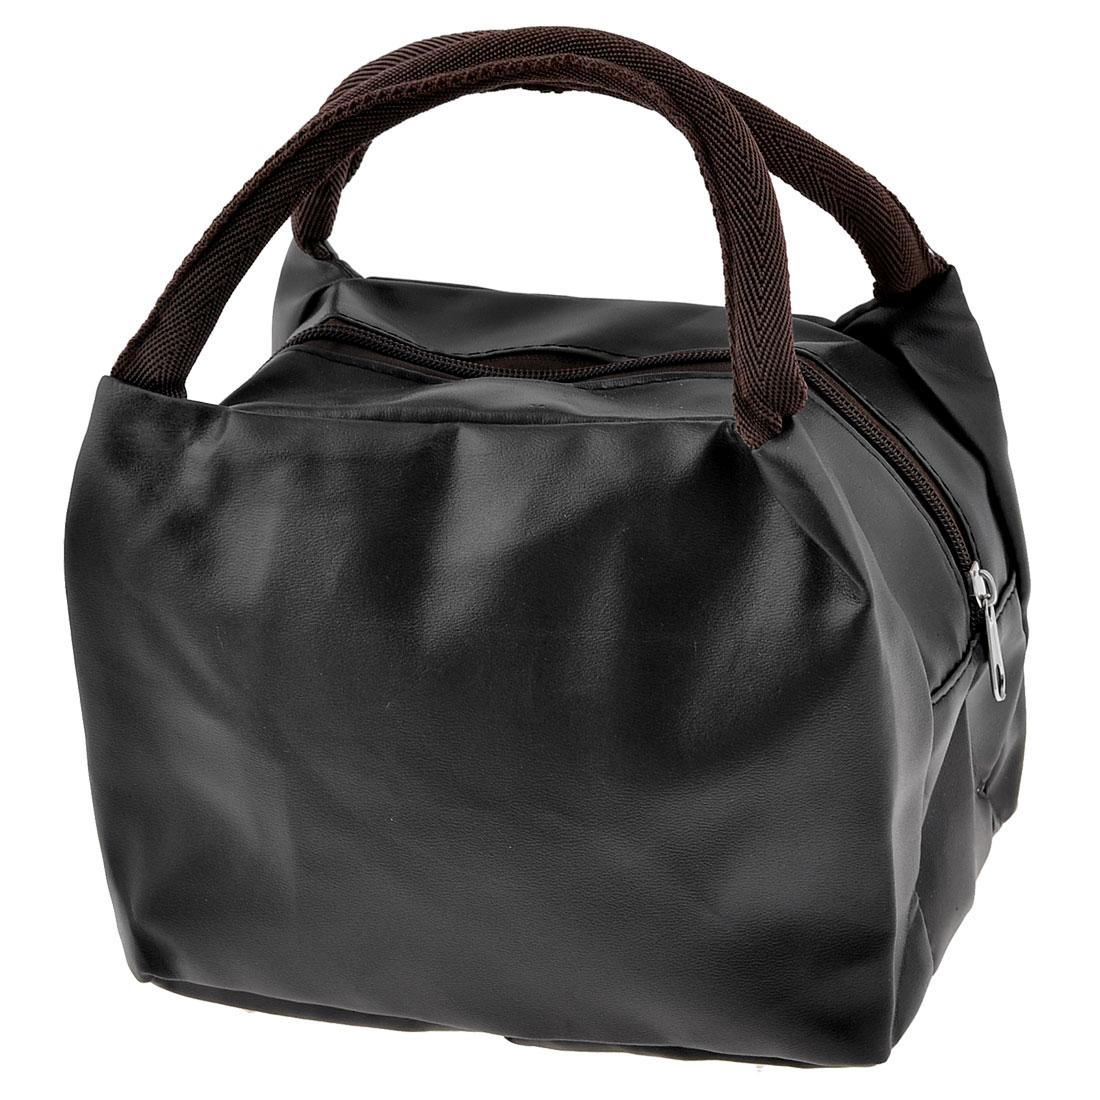 Lady Black Faux Leather Waterproof Make Up Case Handbag